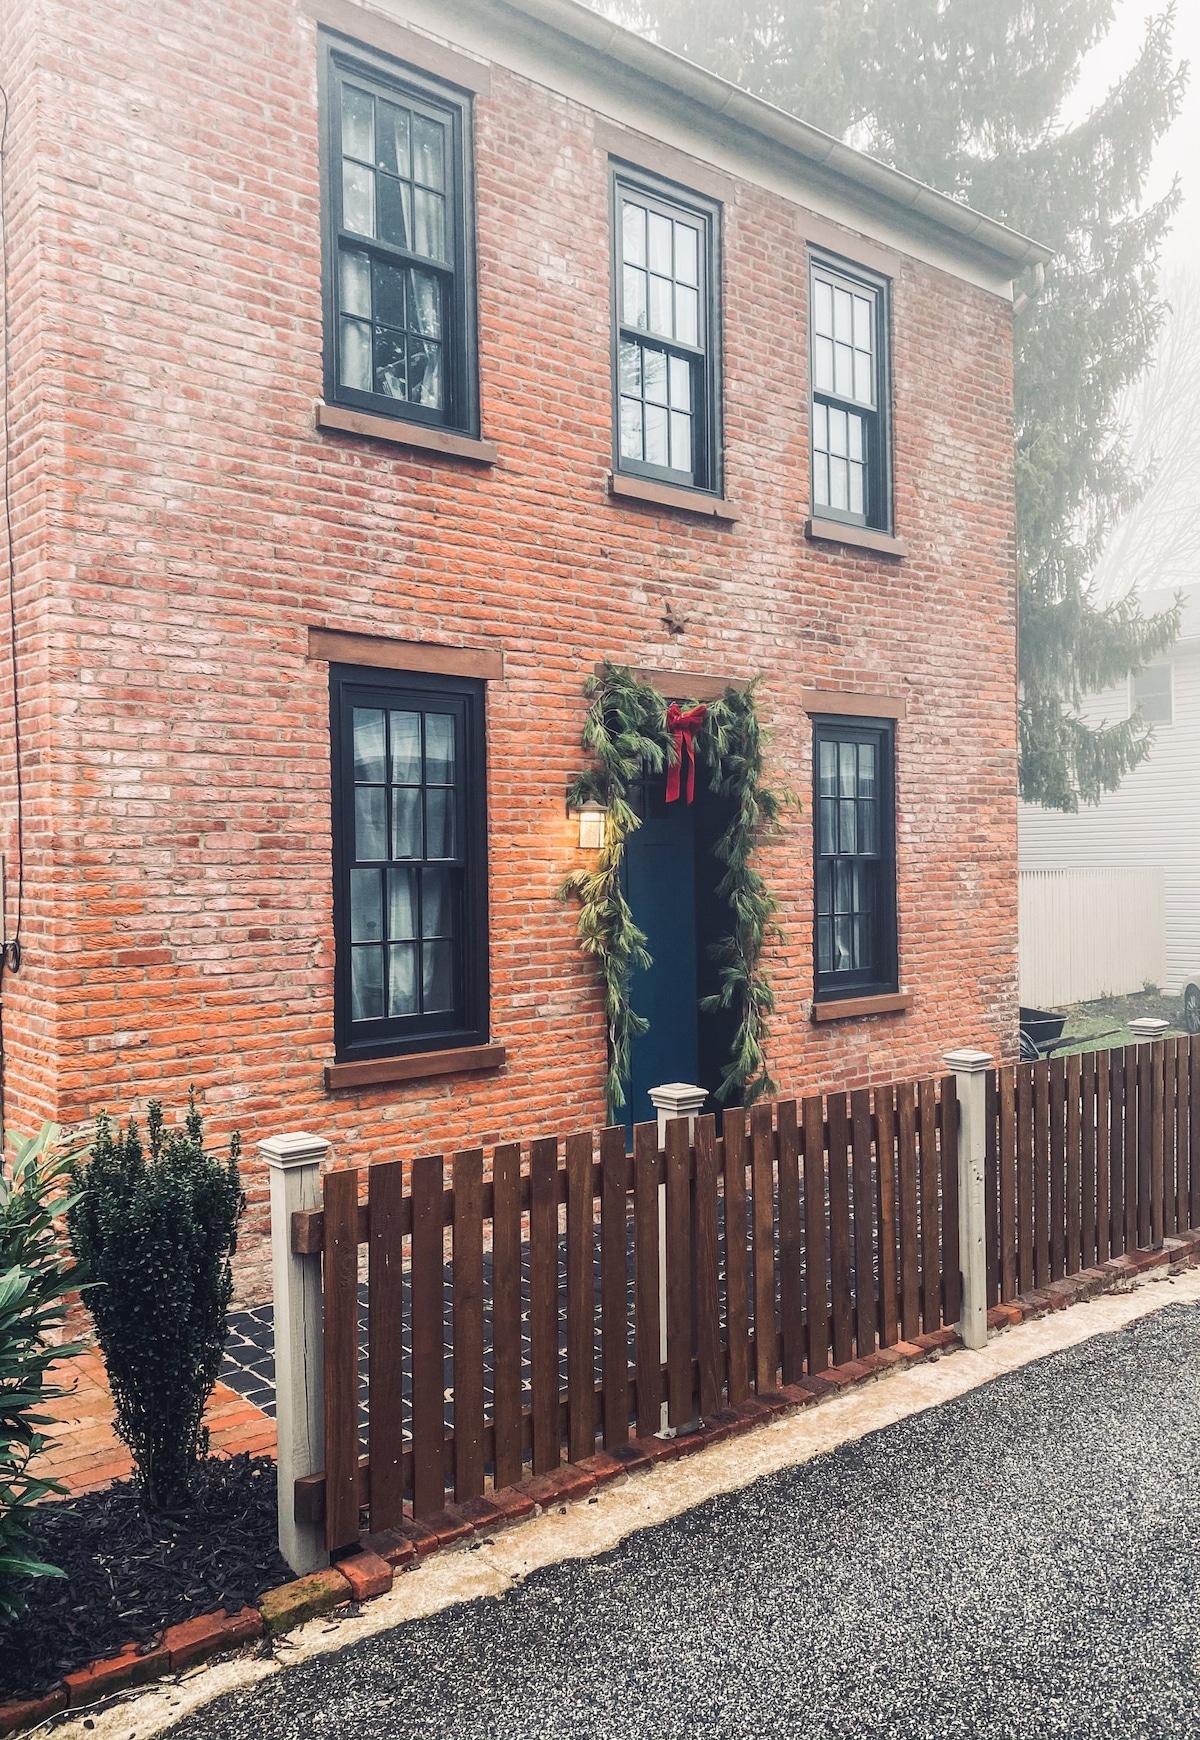 The Little House on Mary Street